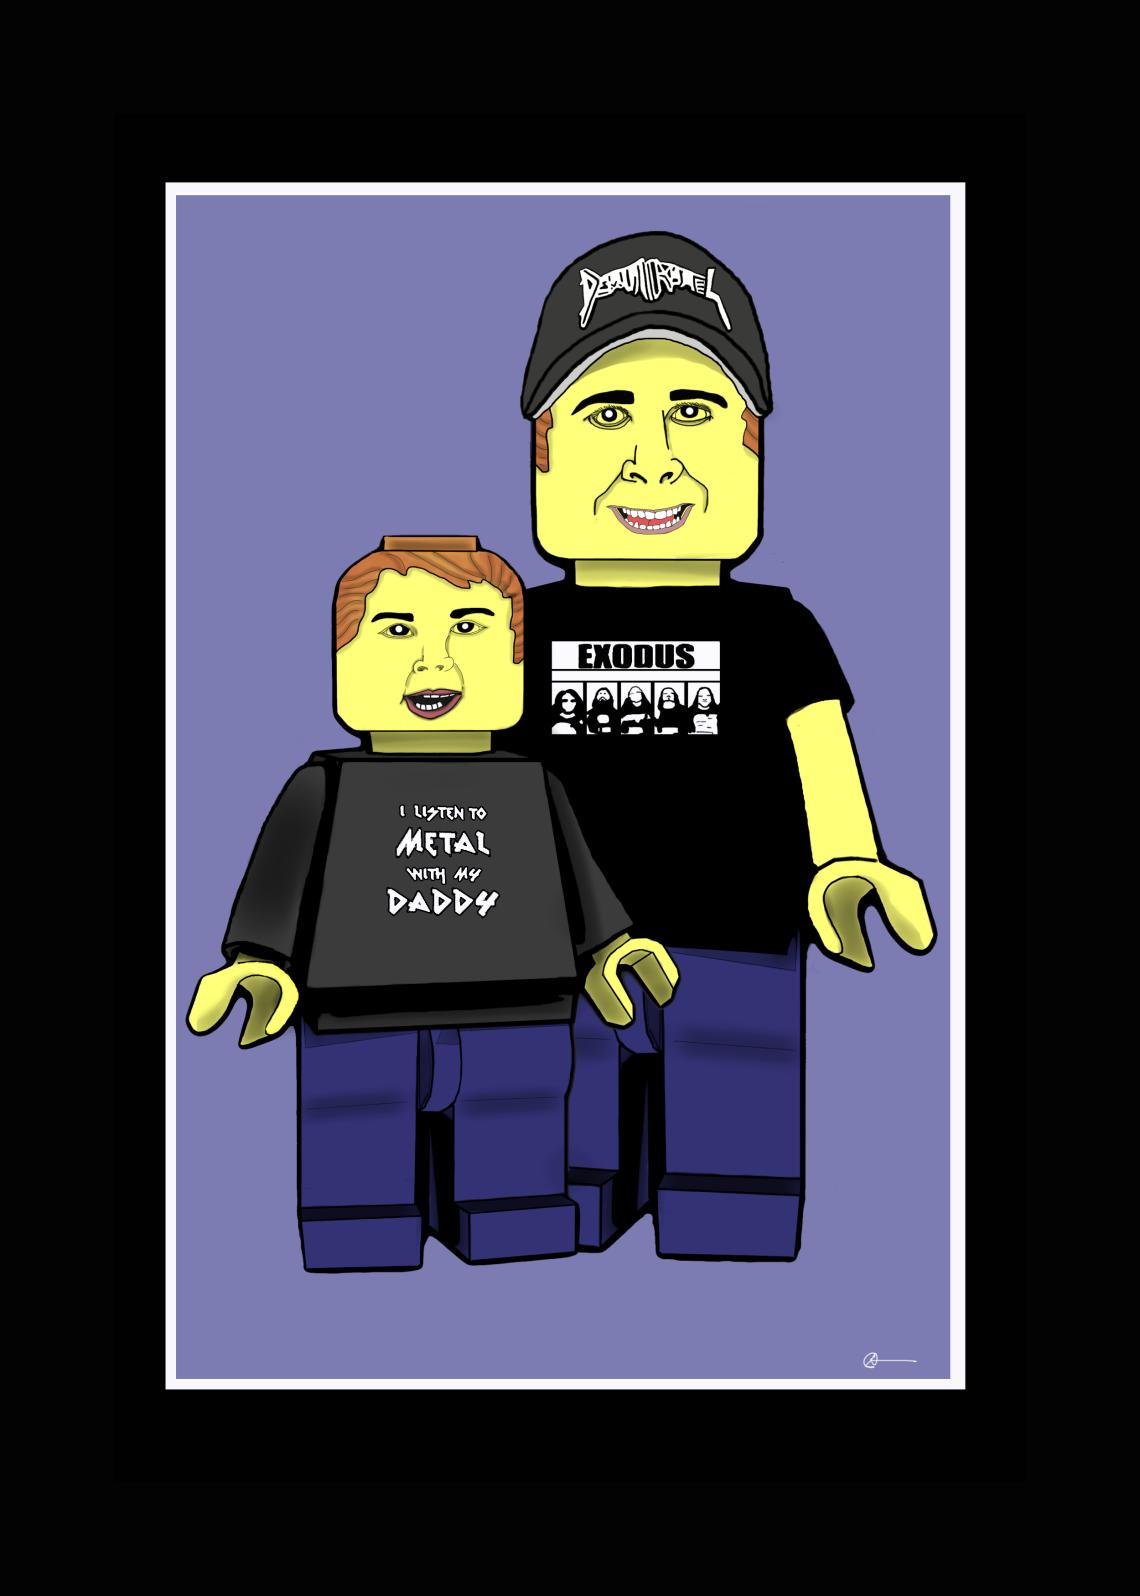 LEGO Dan and Brendan (Commission) by Gerry Albert - More From the Artist: http://gerryalbert.deviantart.com/gallery/